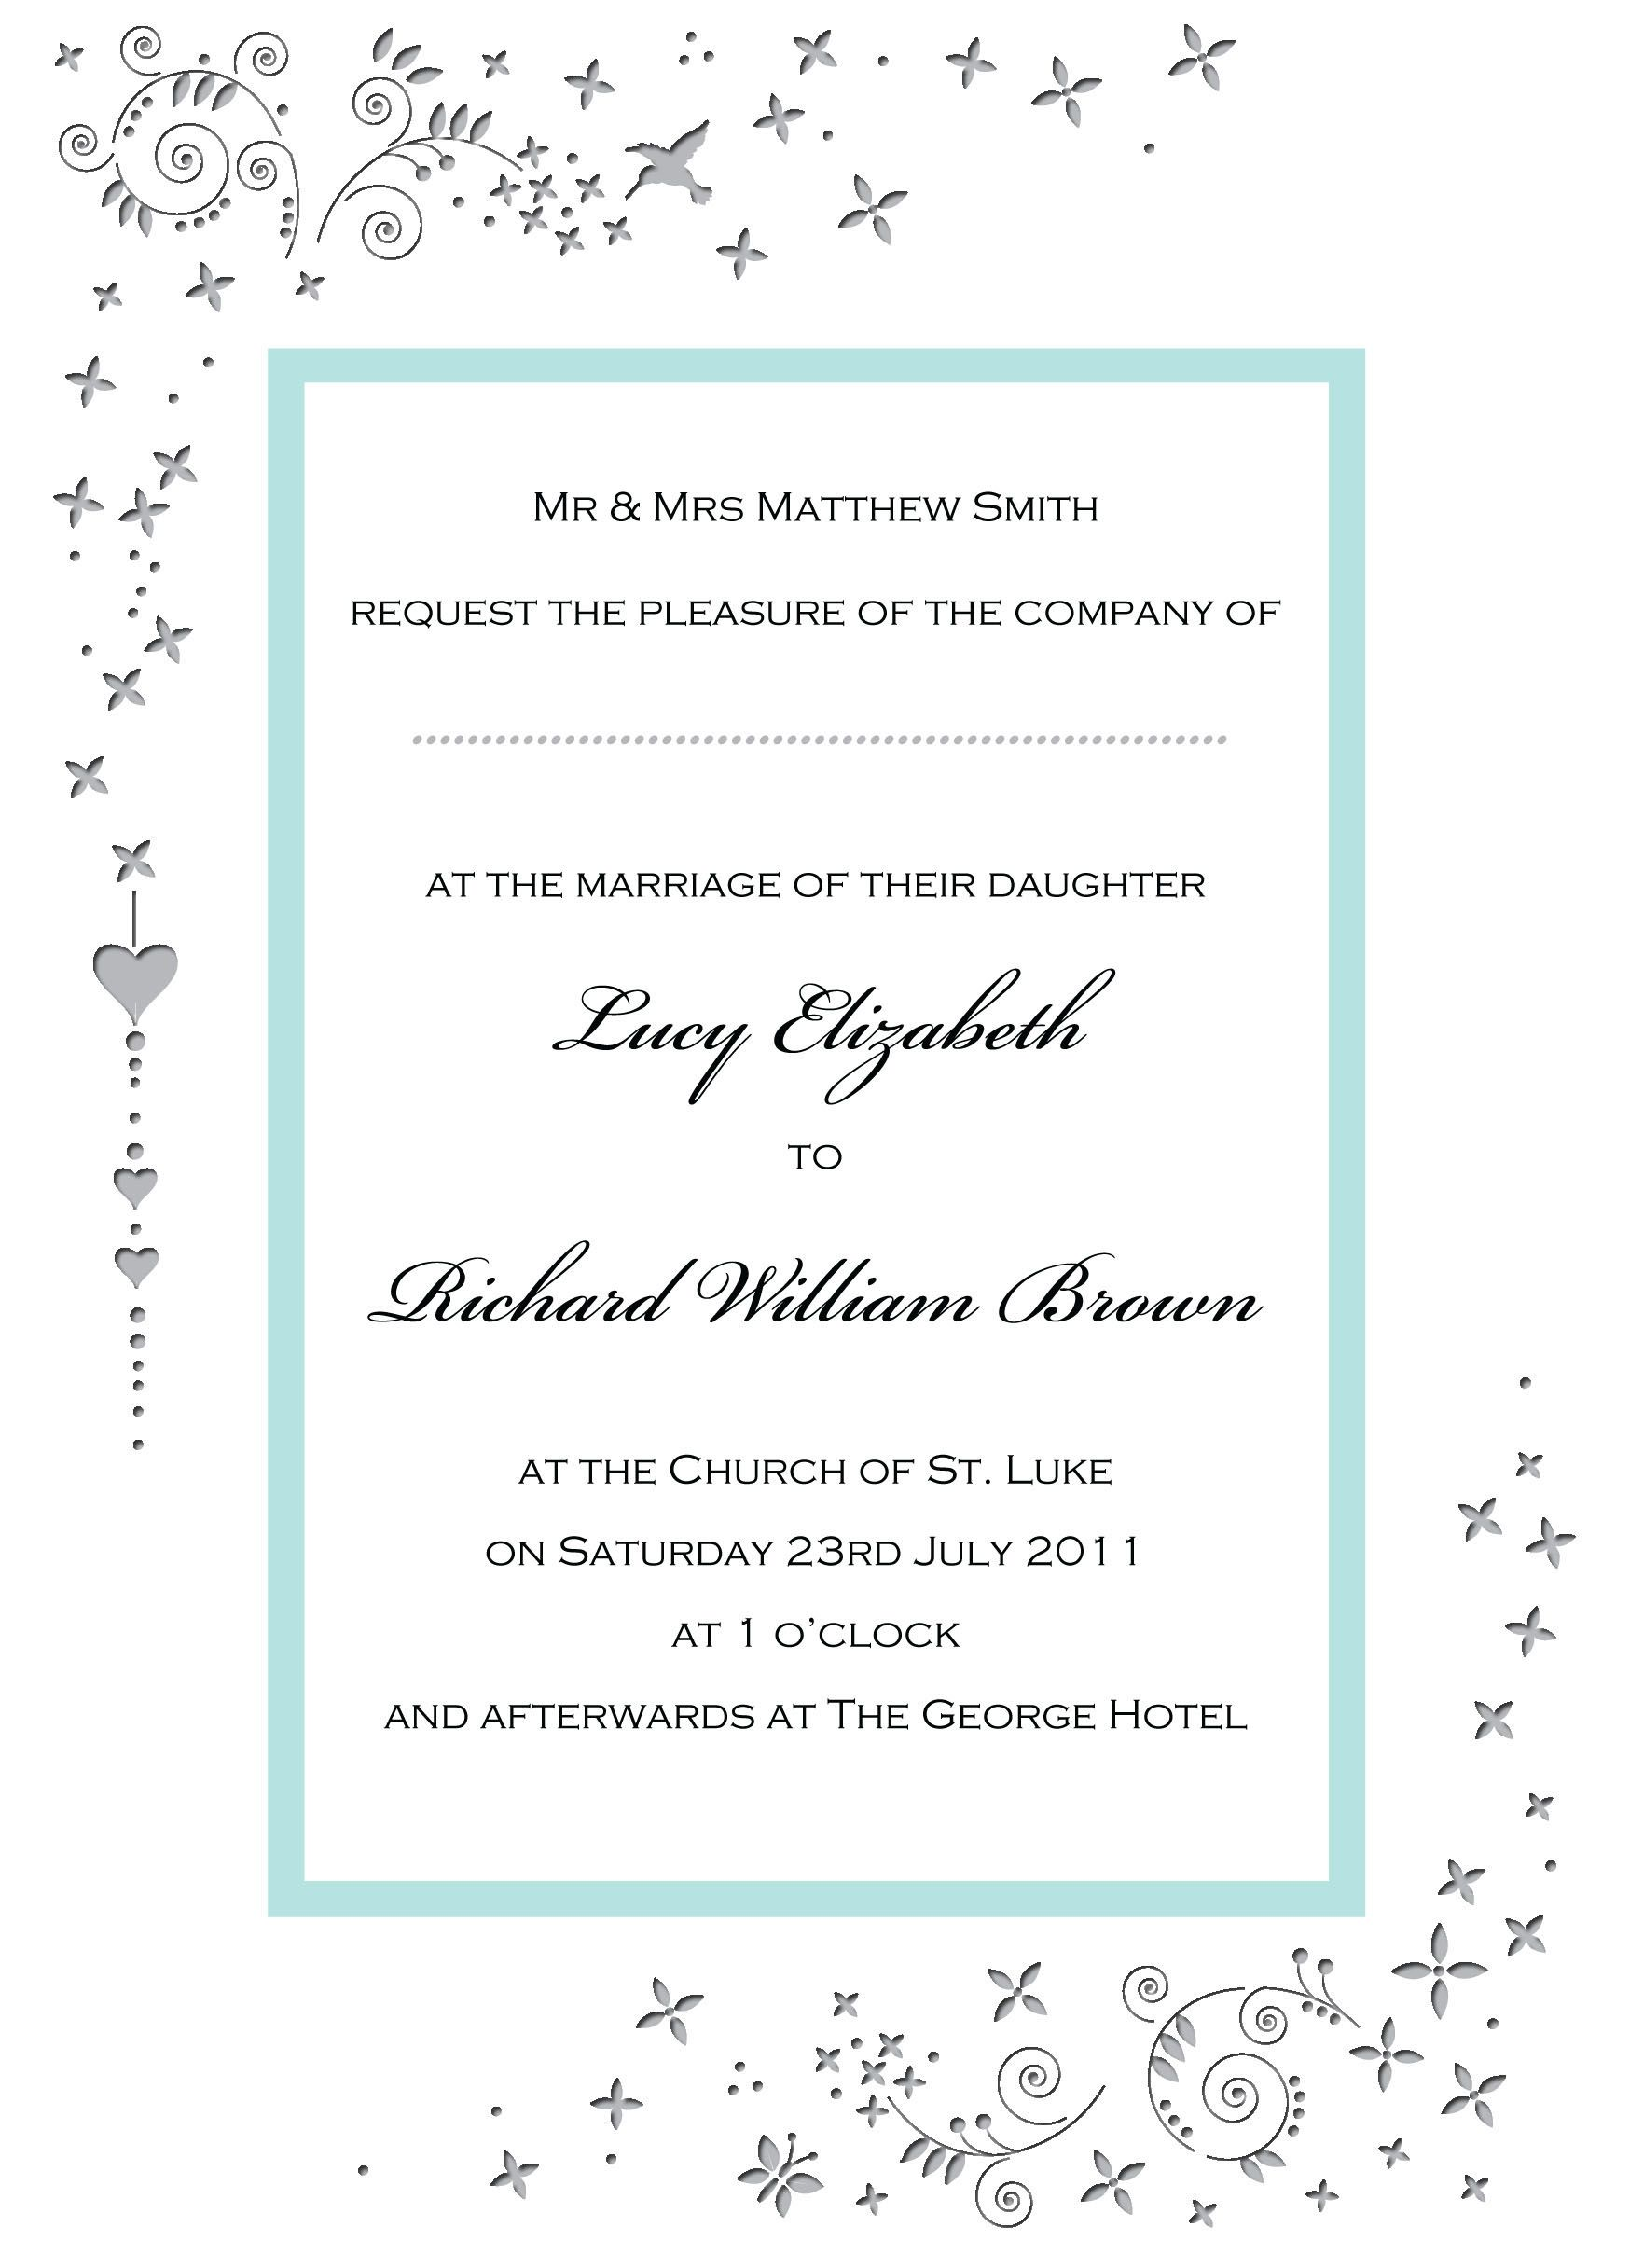 Diy Pocket Wedding Invitations Templates as good invitations ...